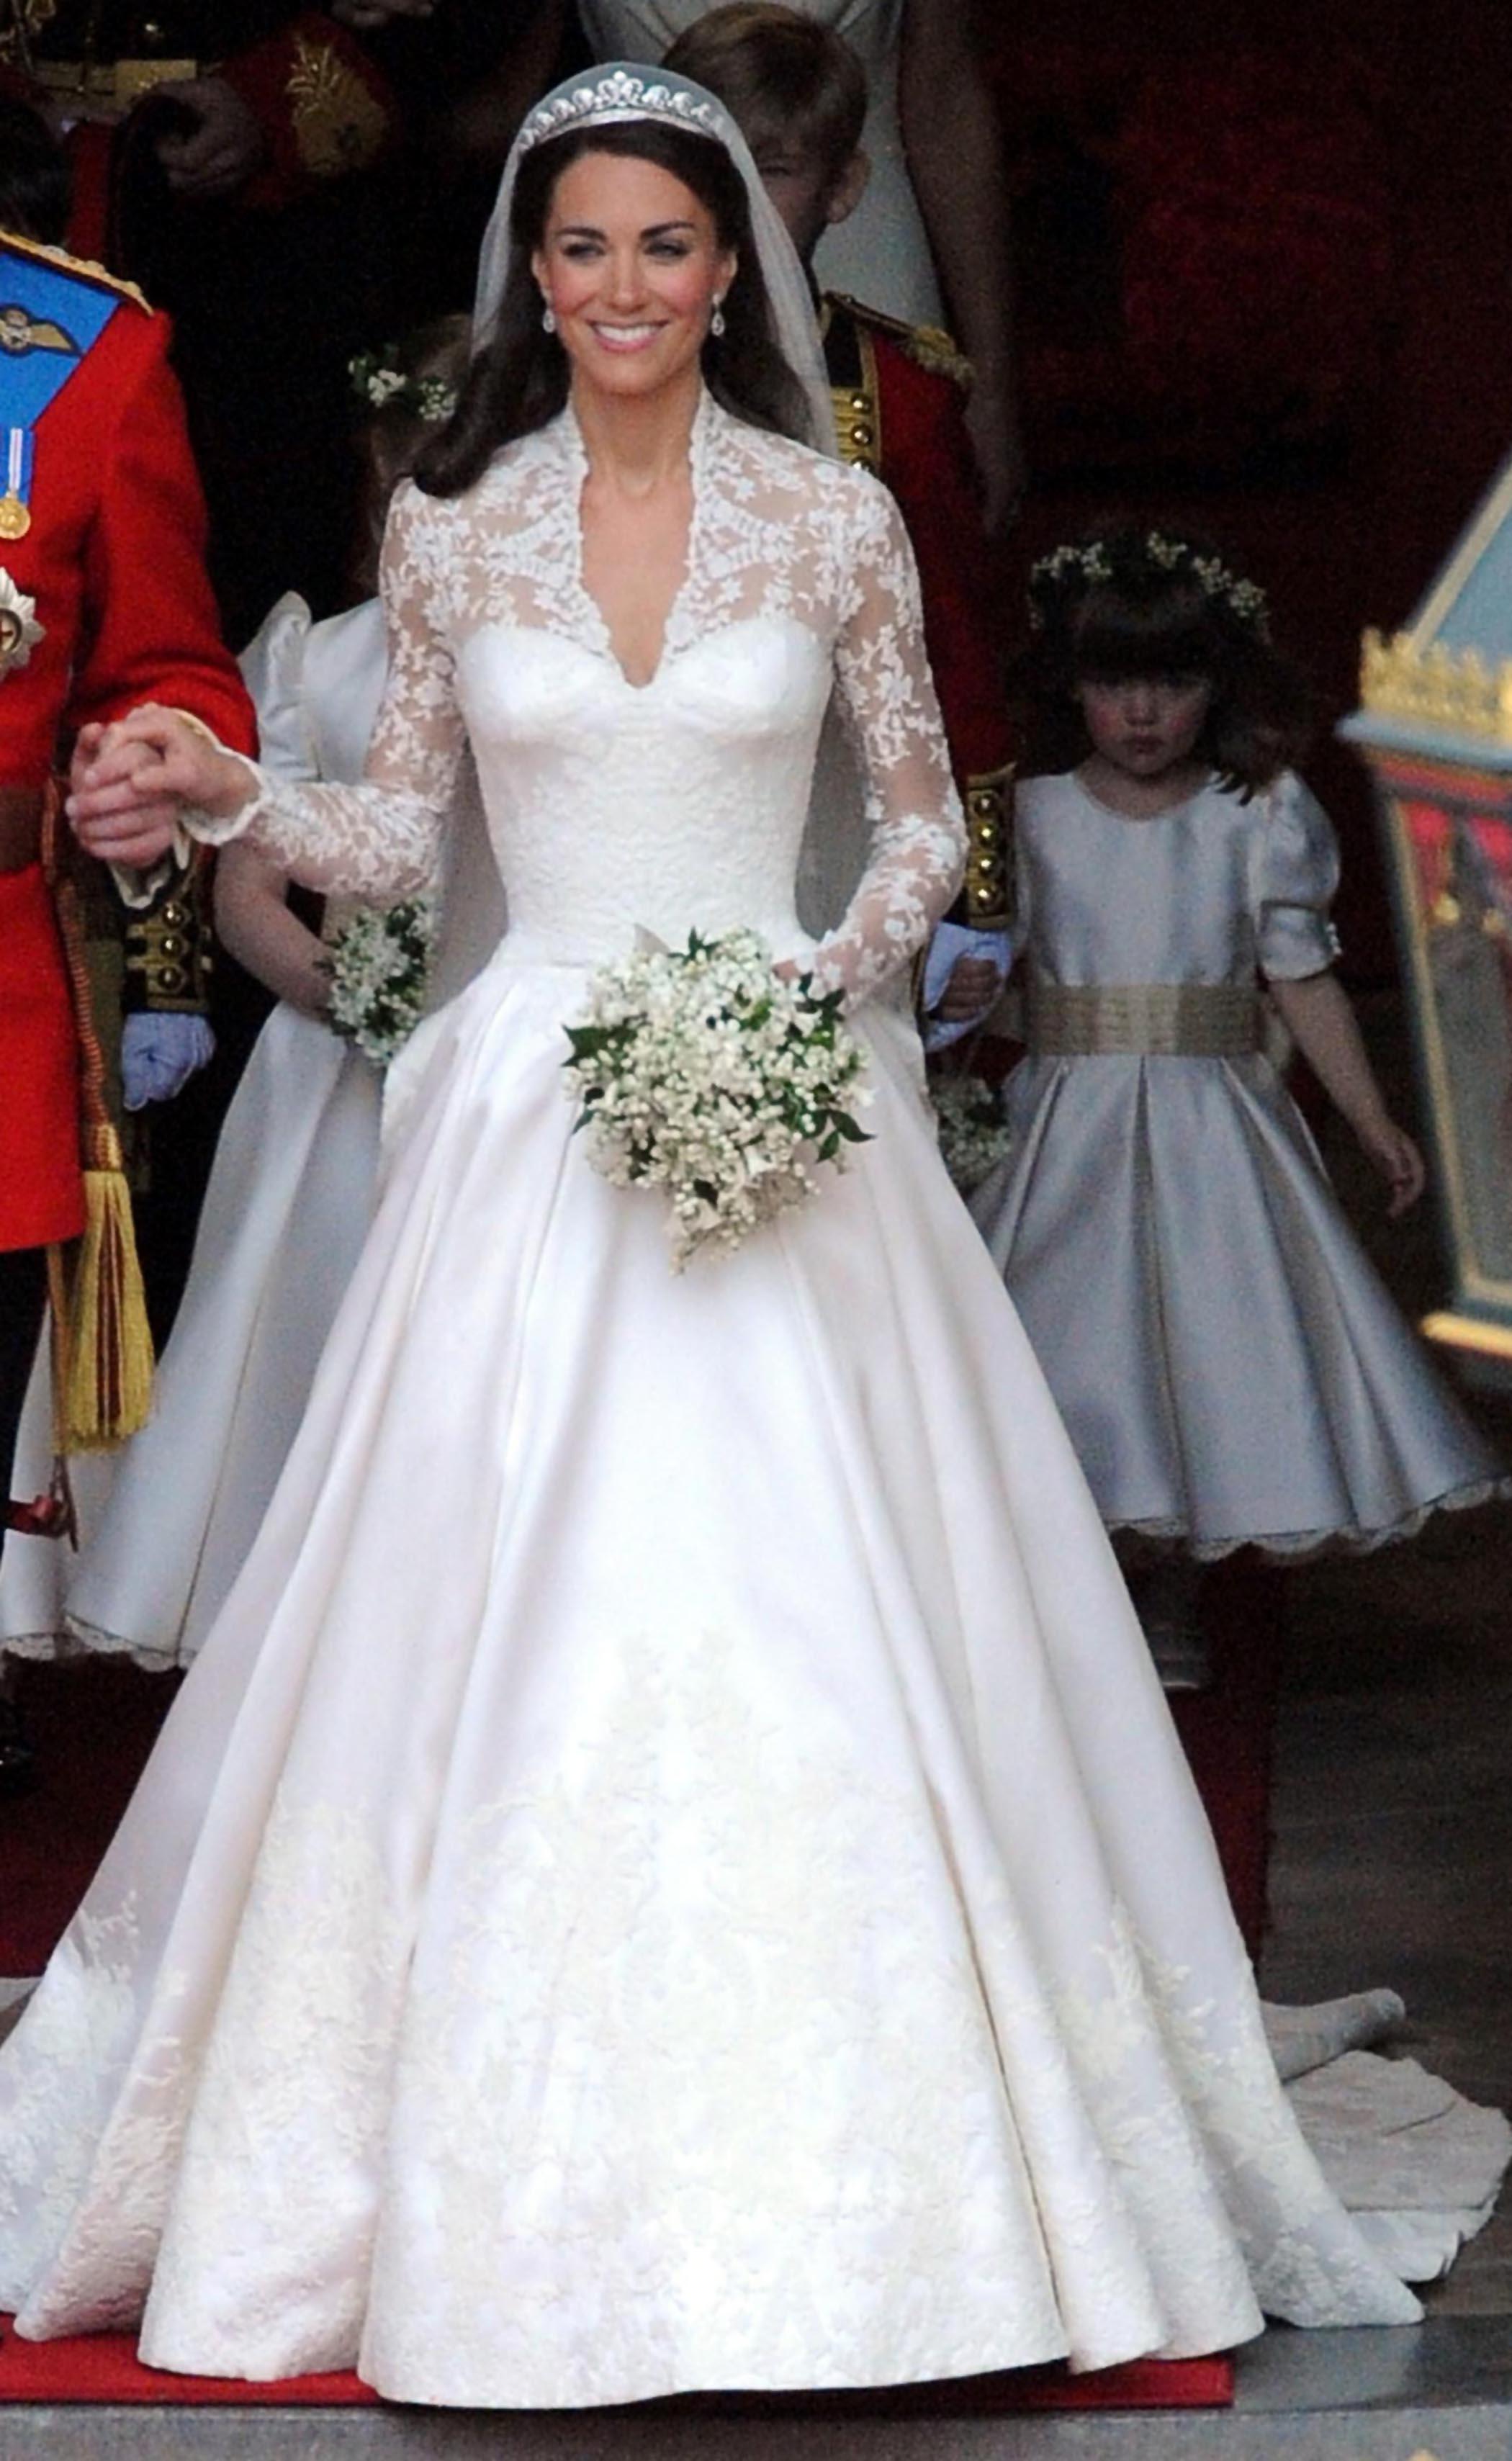 Drawn wedding dress most expensive Middleton & Kate Iconic dress